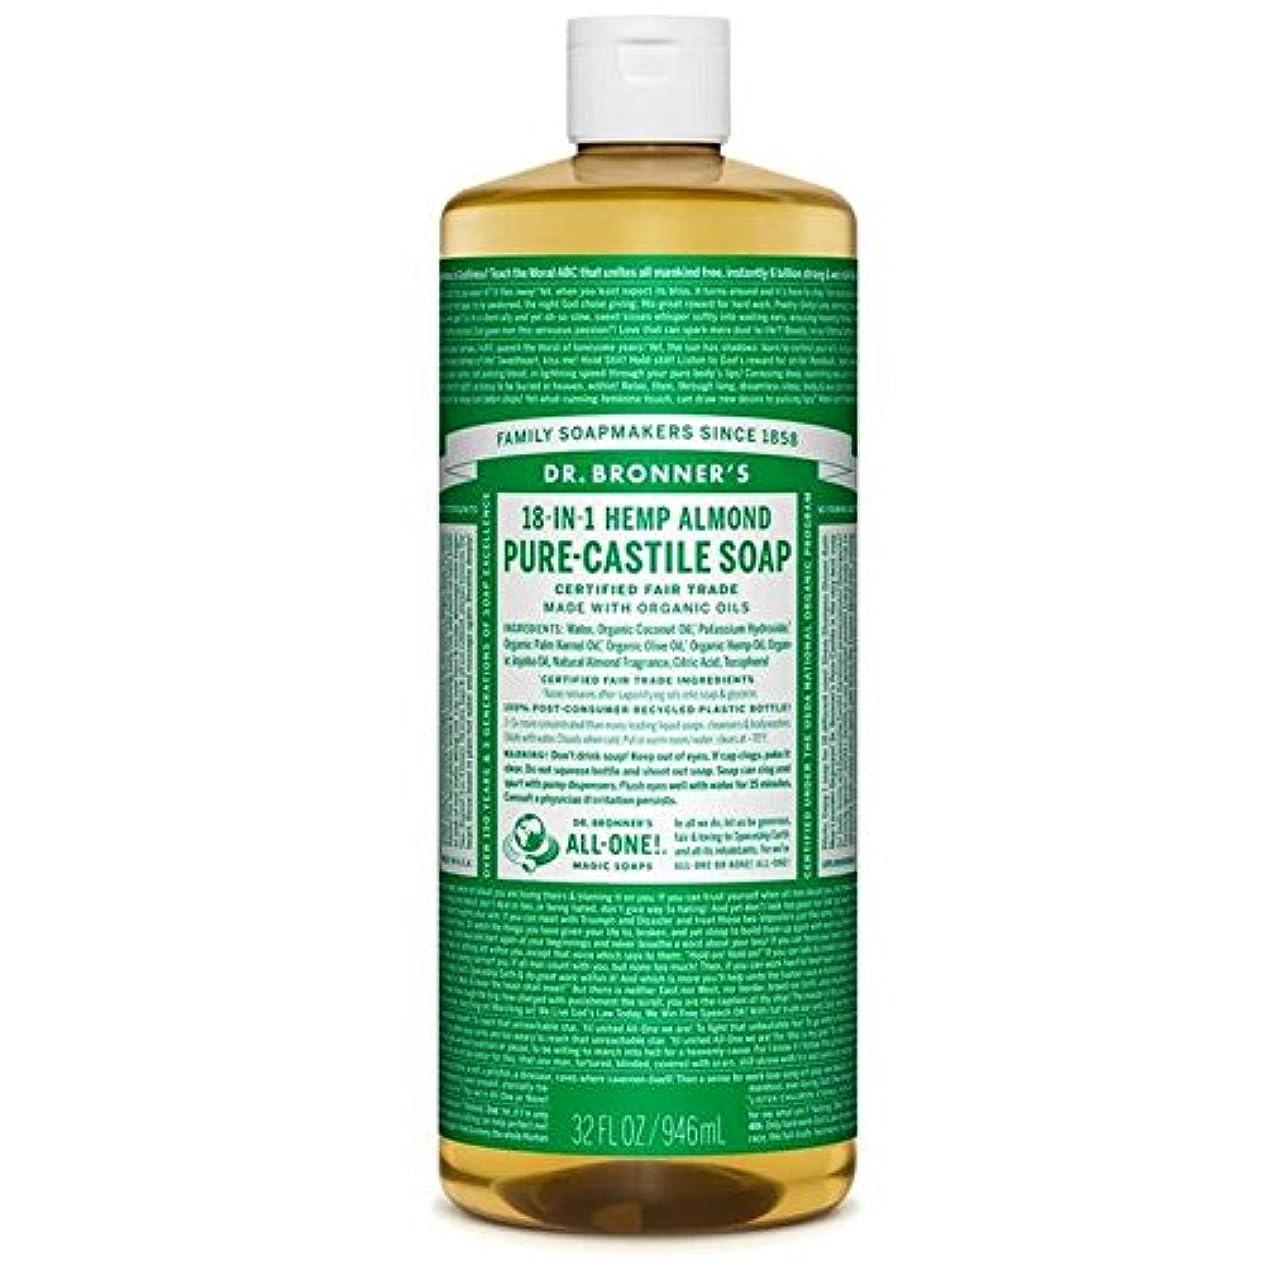 Dr Bronner Organic Almond Castile Liquid Soap 946ml (Pack of 6) - のブロナー有機アーモンドカスティーリャ液体石鹸946ミリリットル x6 [並行輸入品]